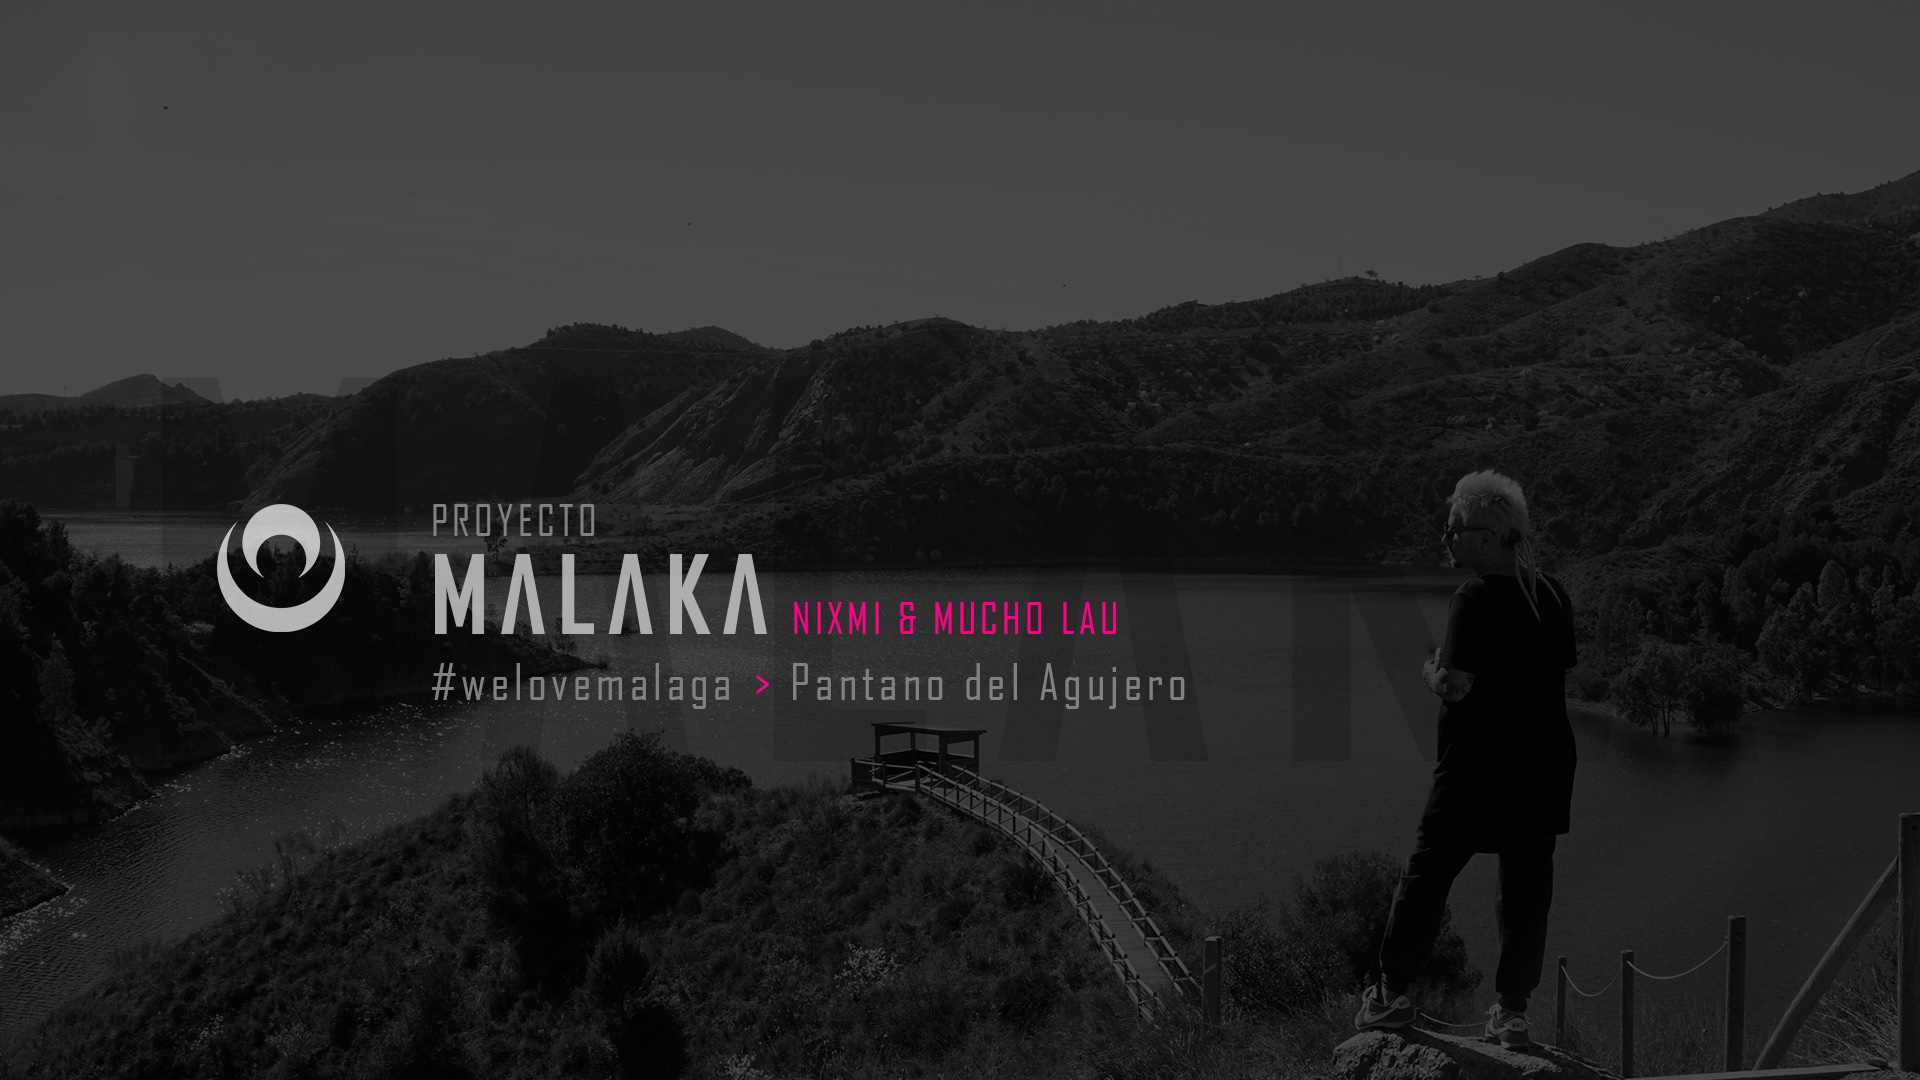 Malaka-1920×1080-pantado-pajaros nixmi